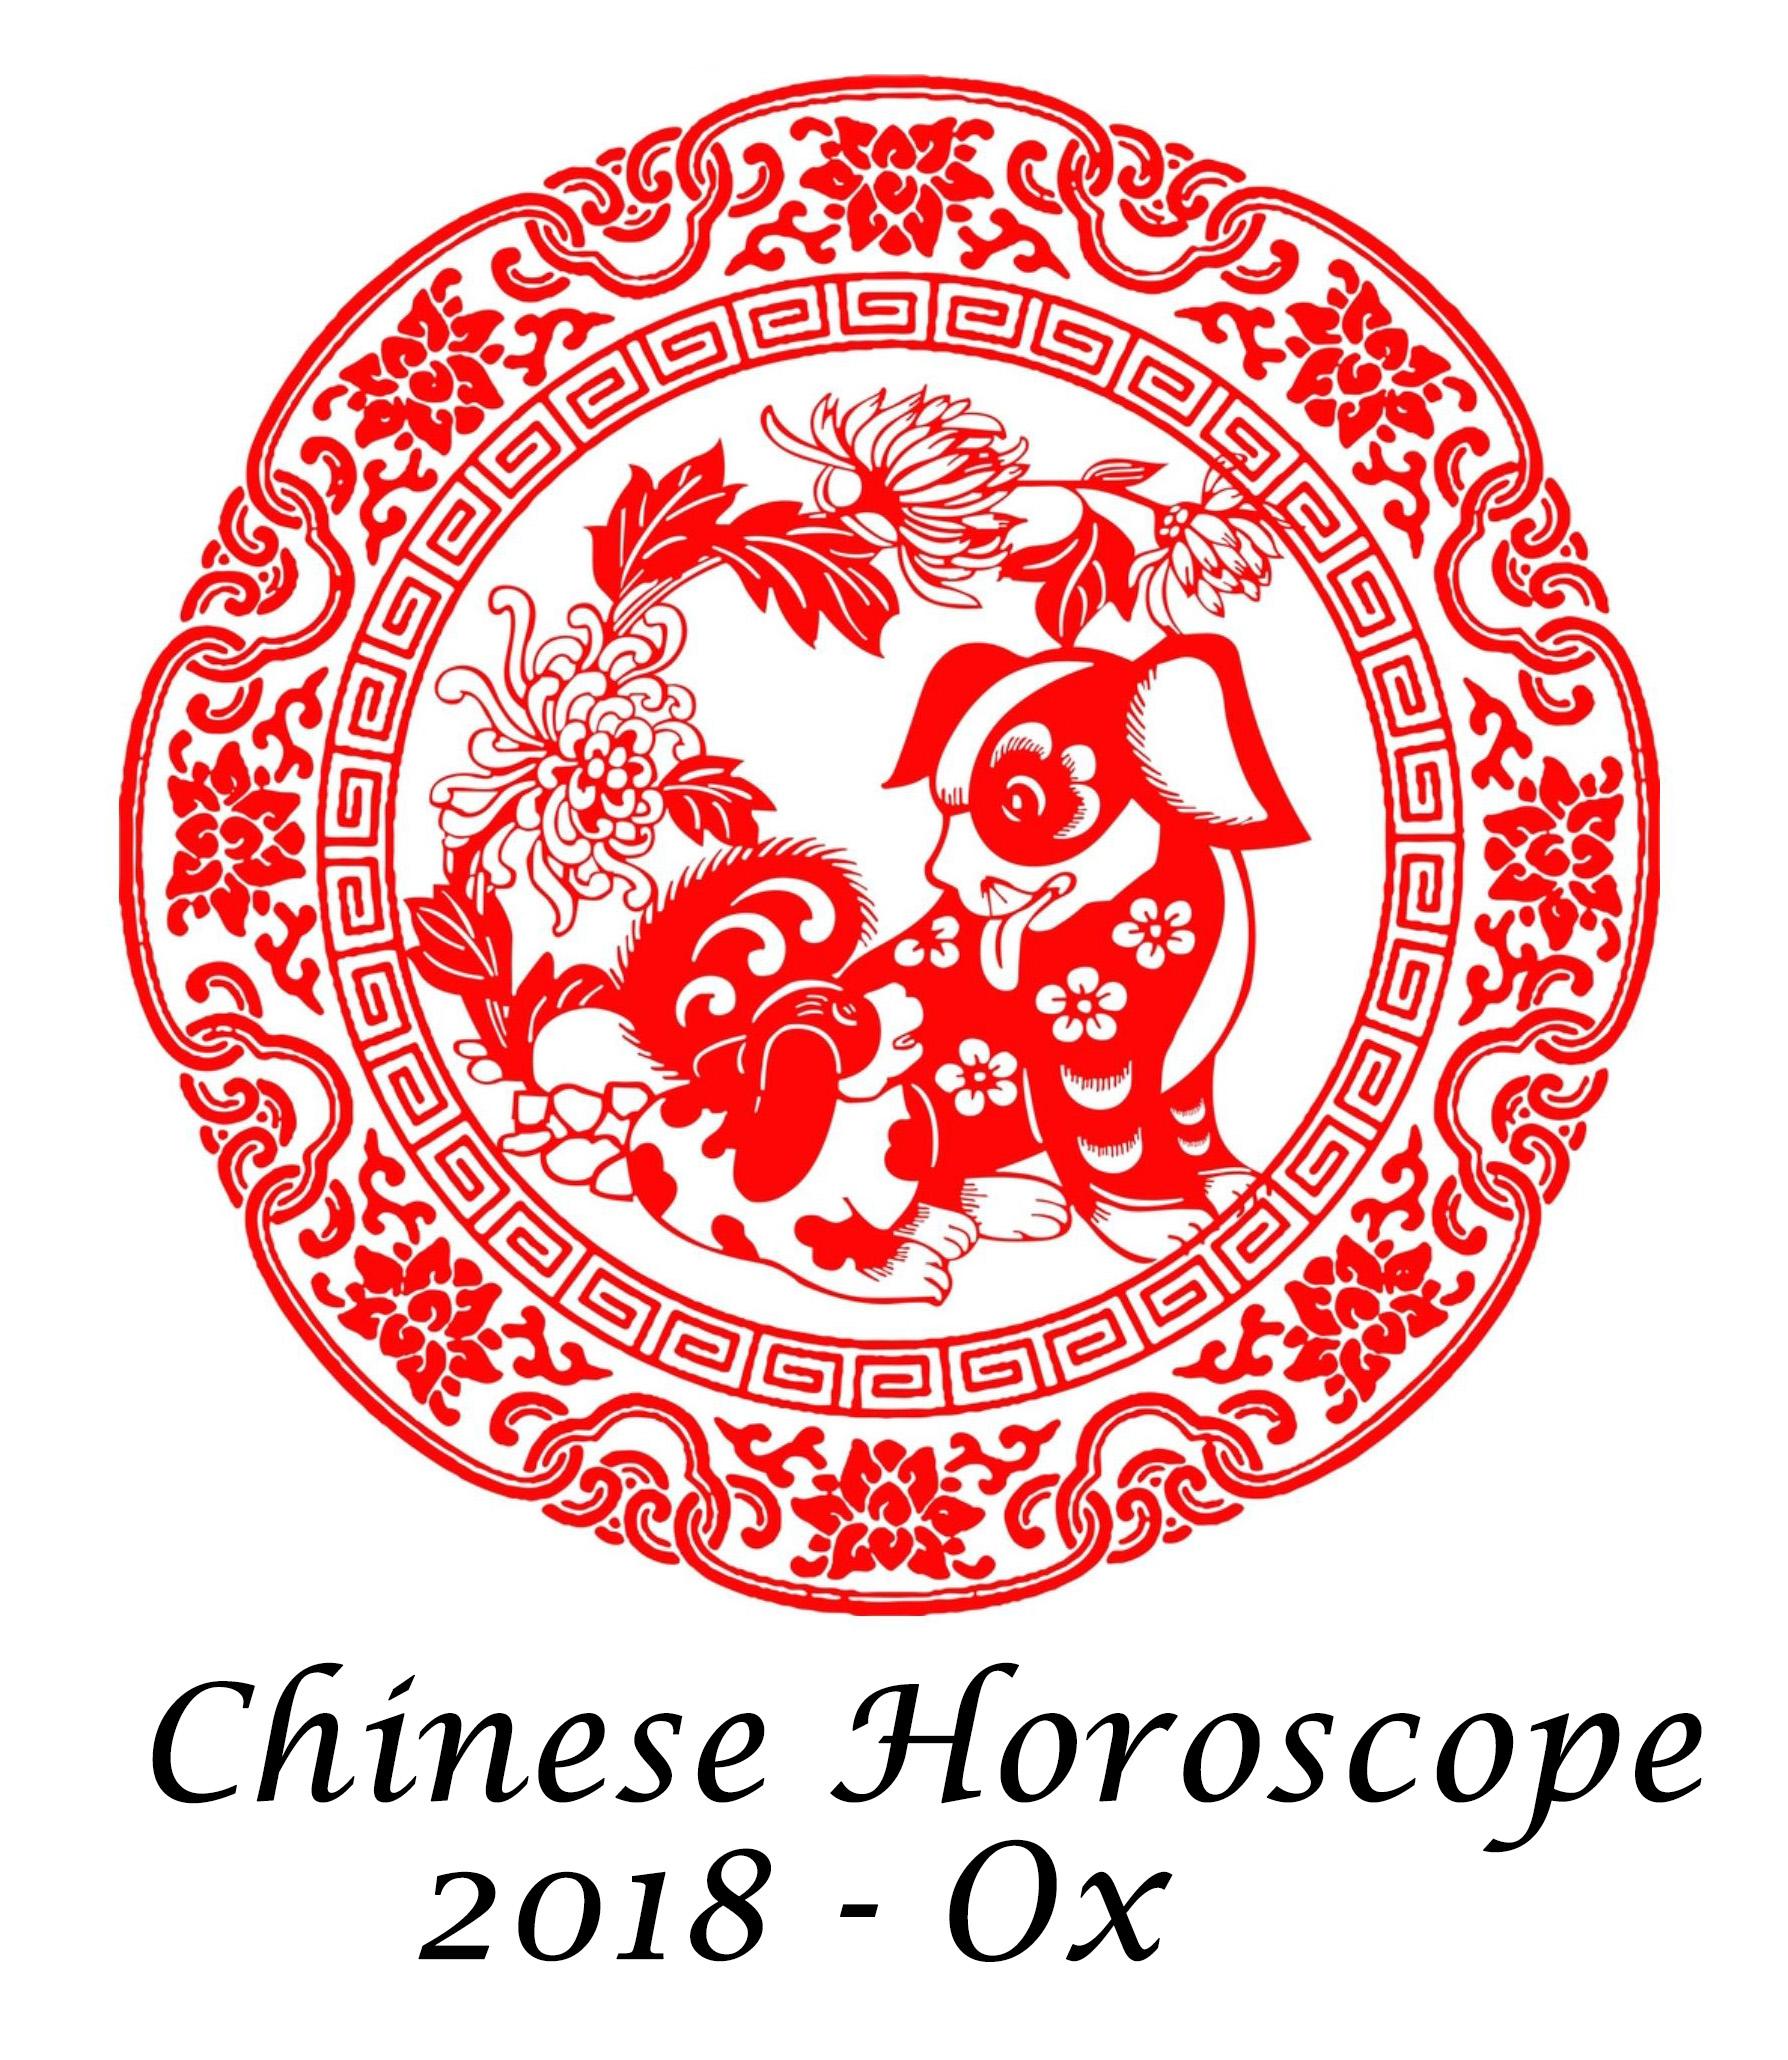 Chinese Horoscope Ox 2018